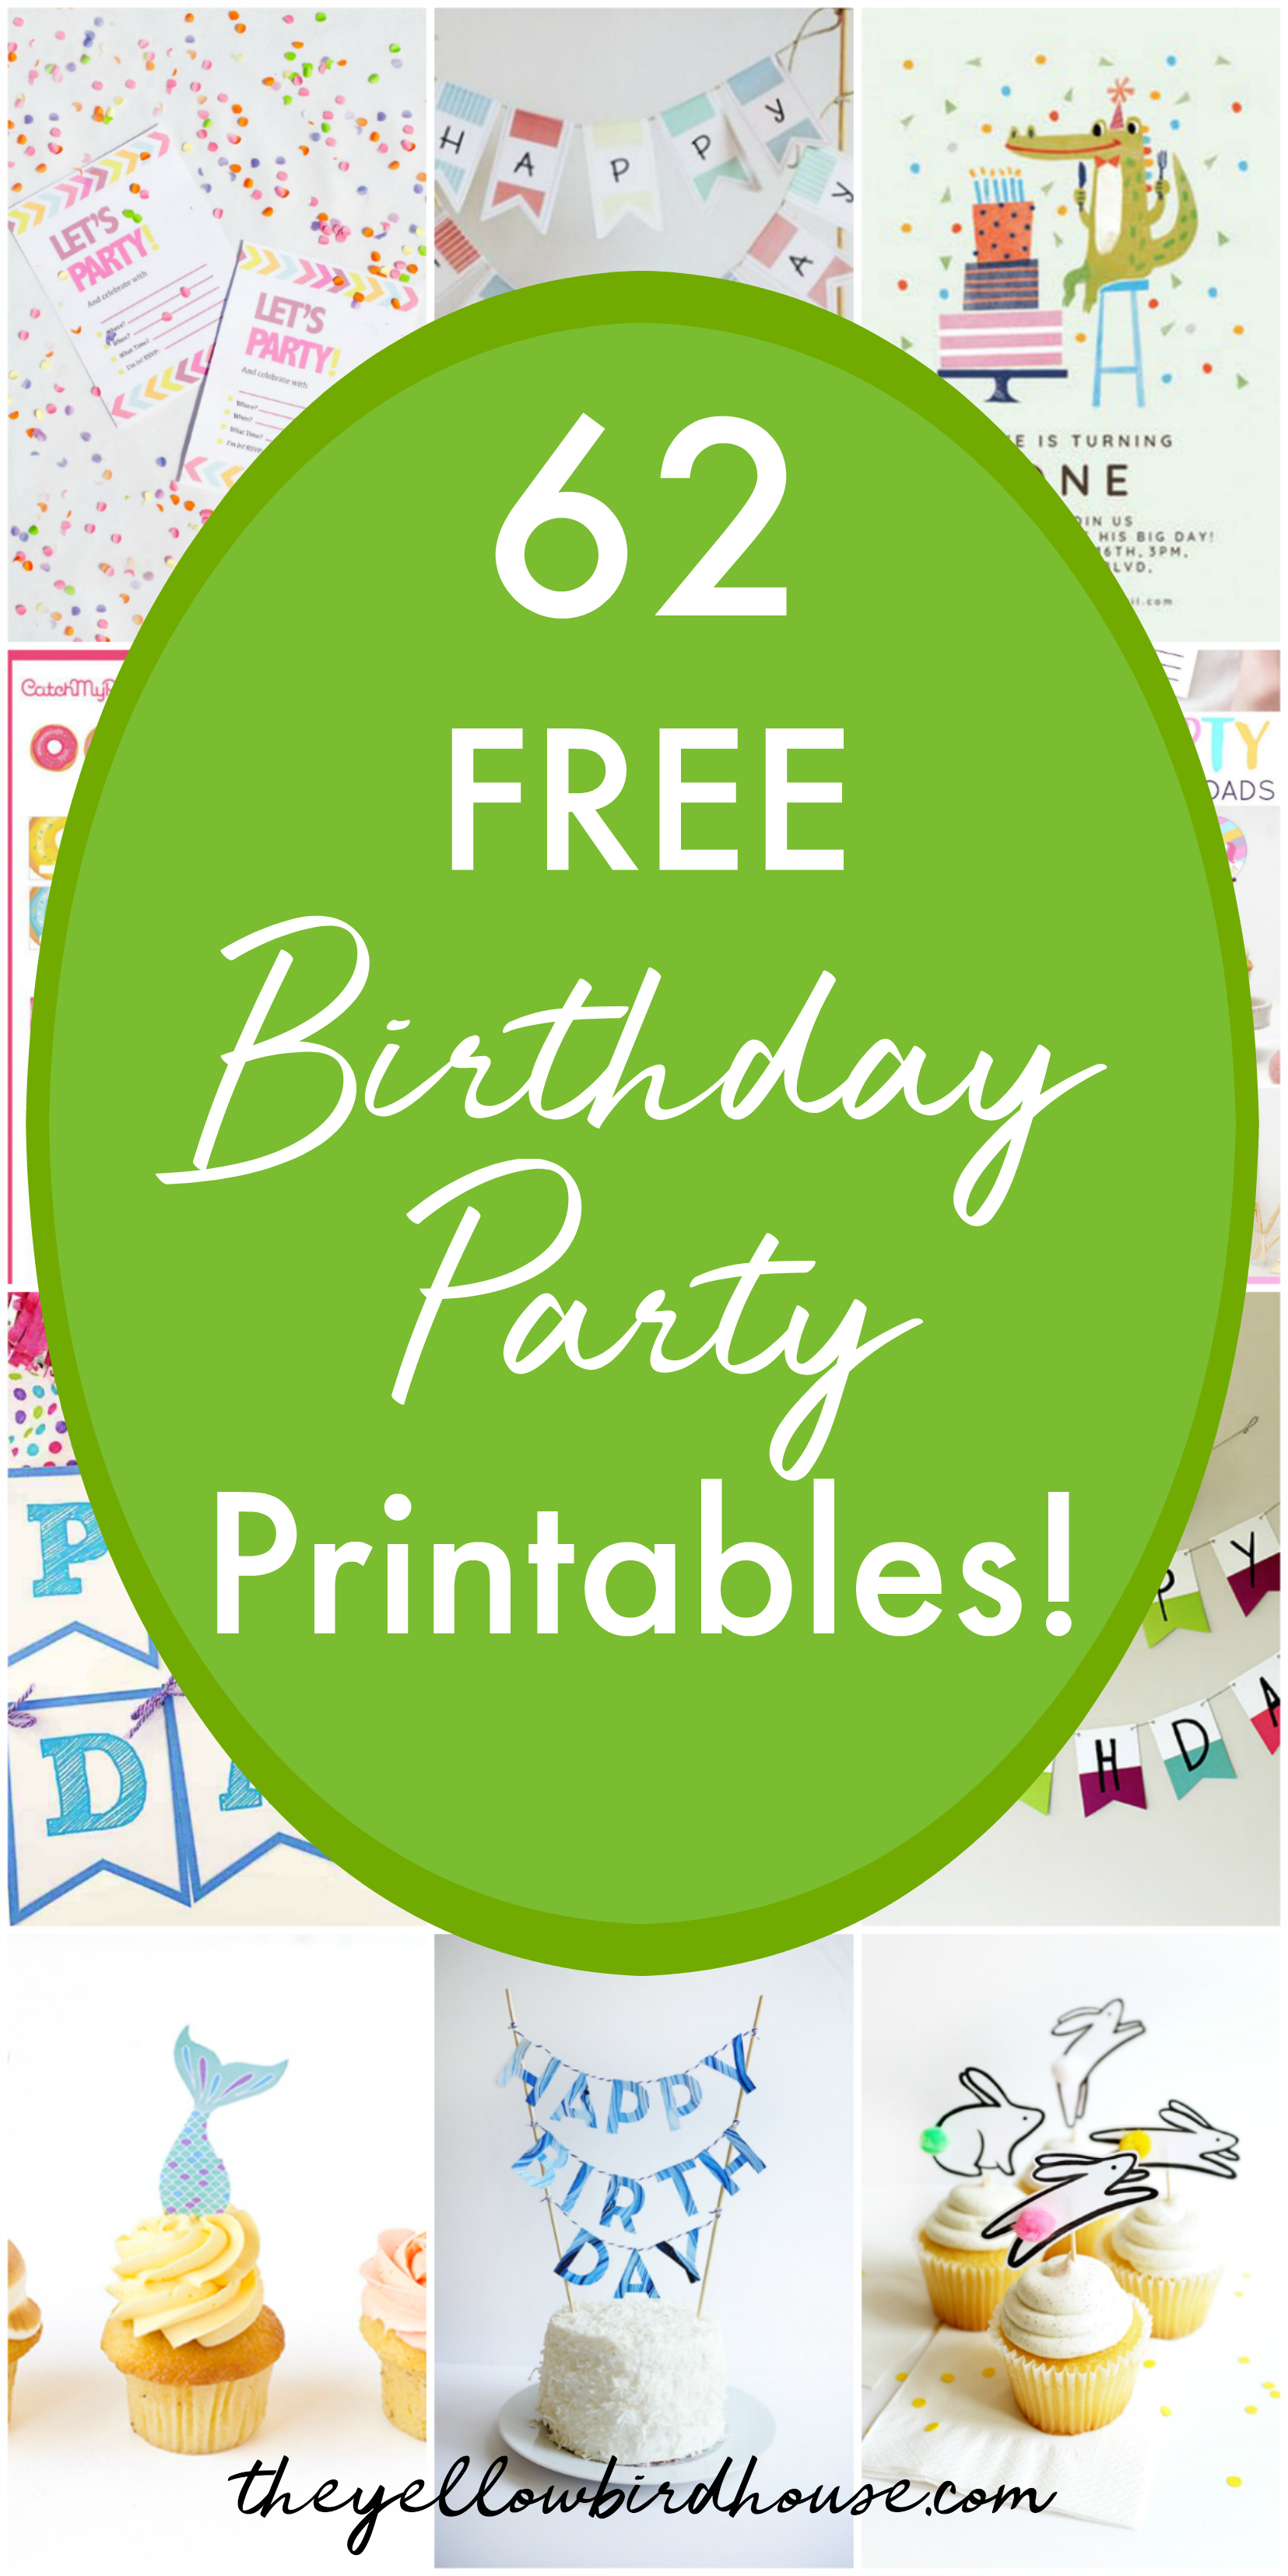 62 Free Birthday Party Printables | The Yellow Birdhouse - Free Birthday Printables